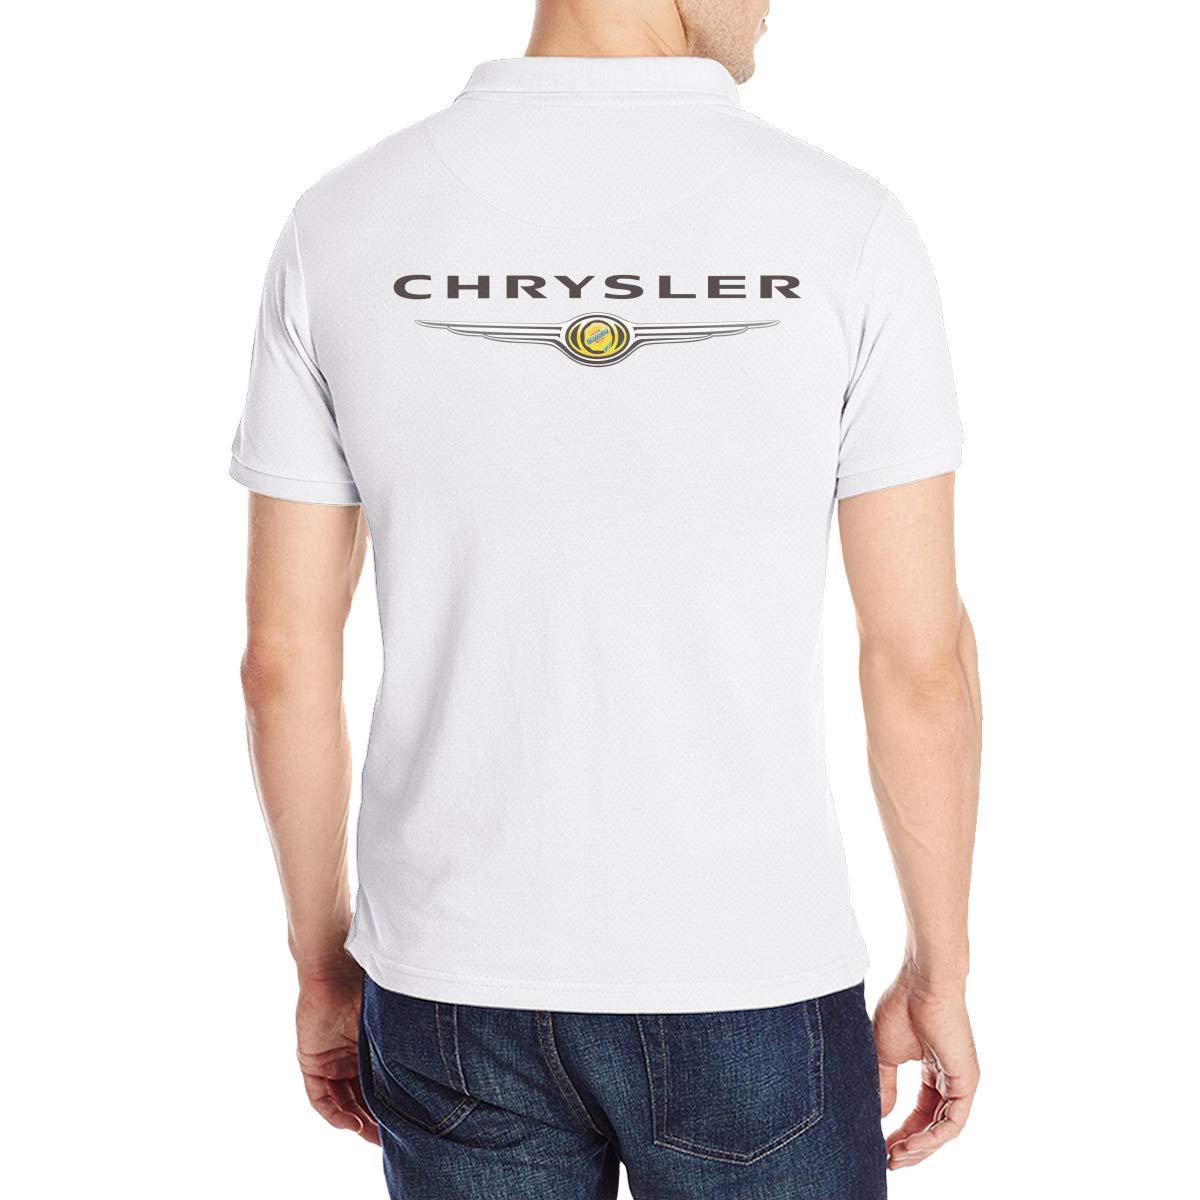 Chrysler Car Logo Mens Short Sleeve Polo Shirt Tee Printed On The Back